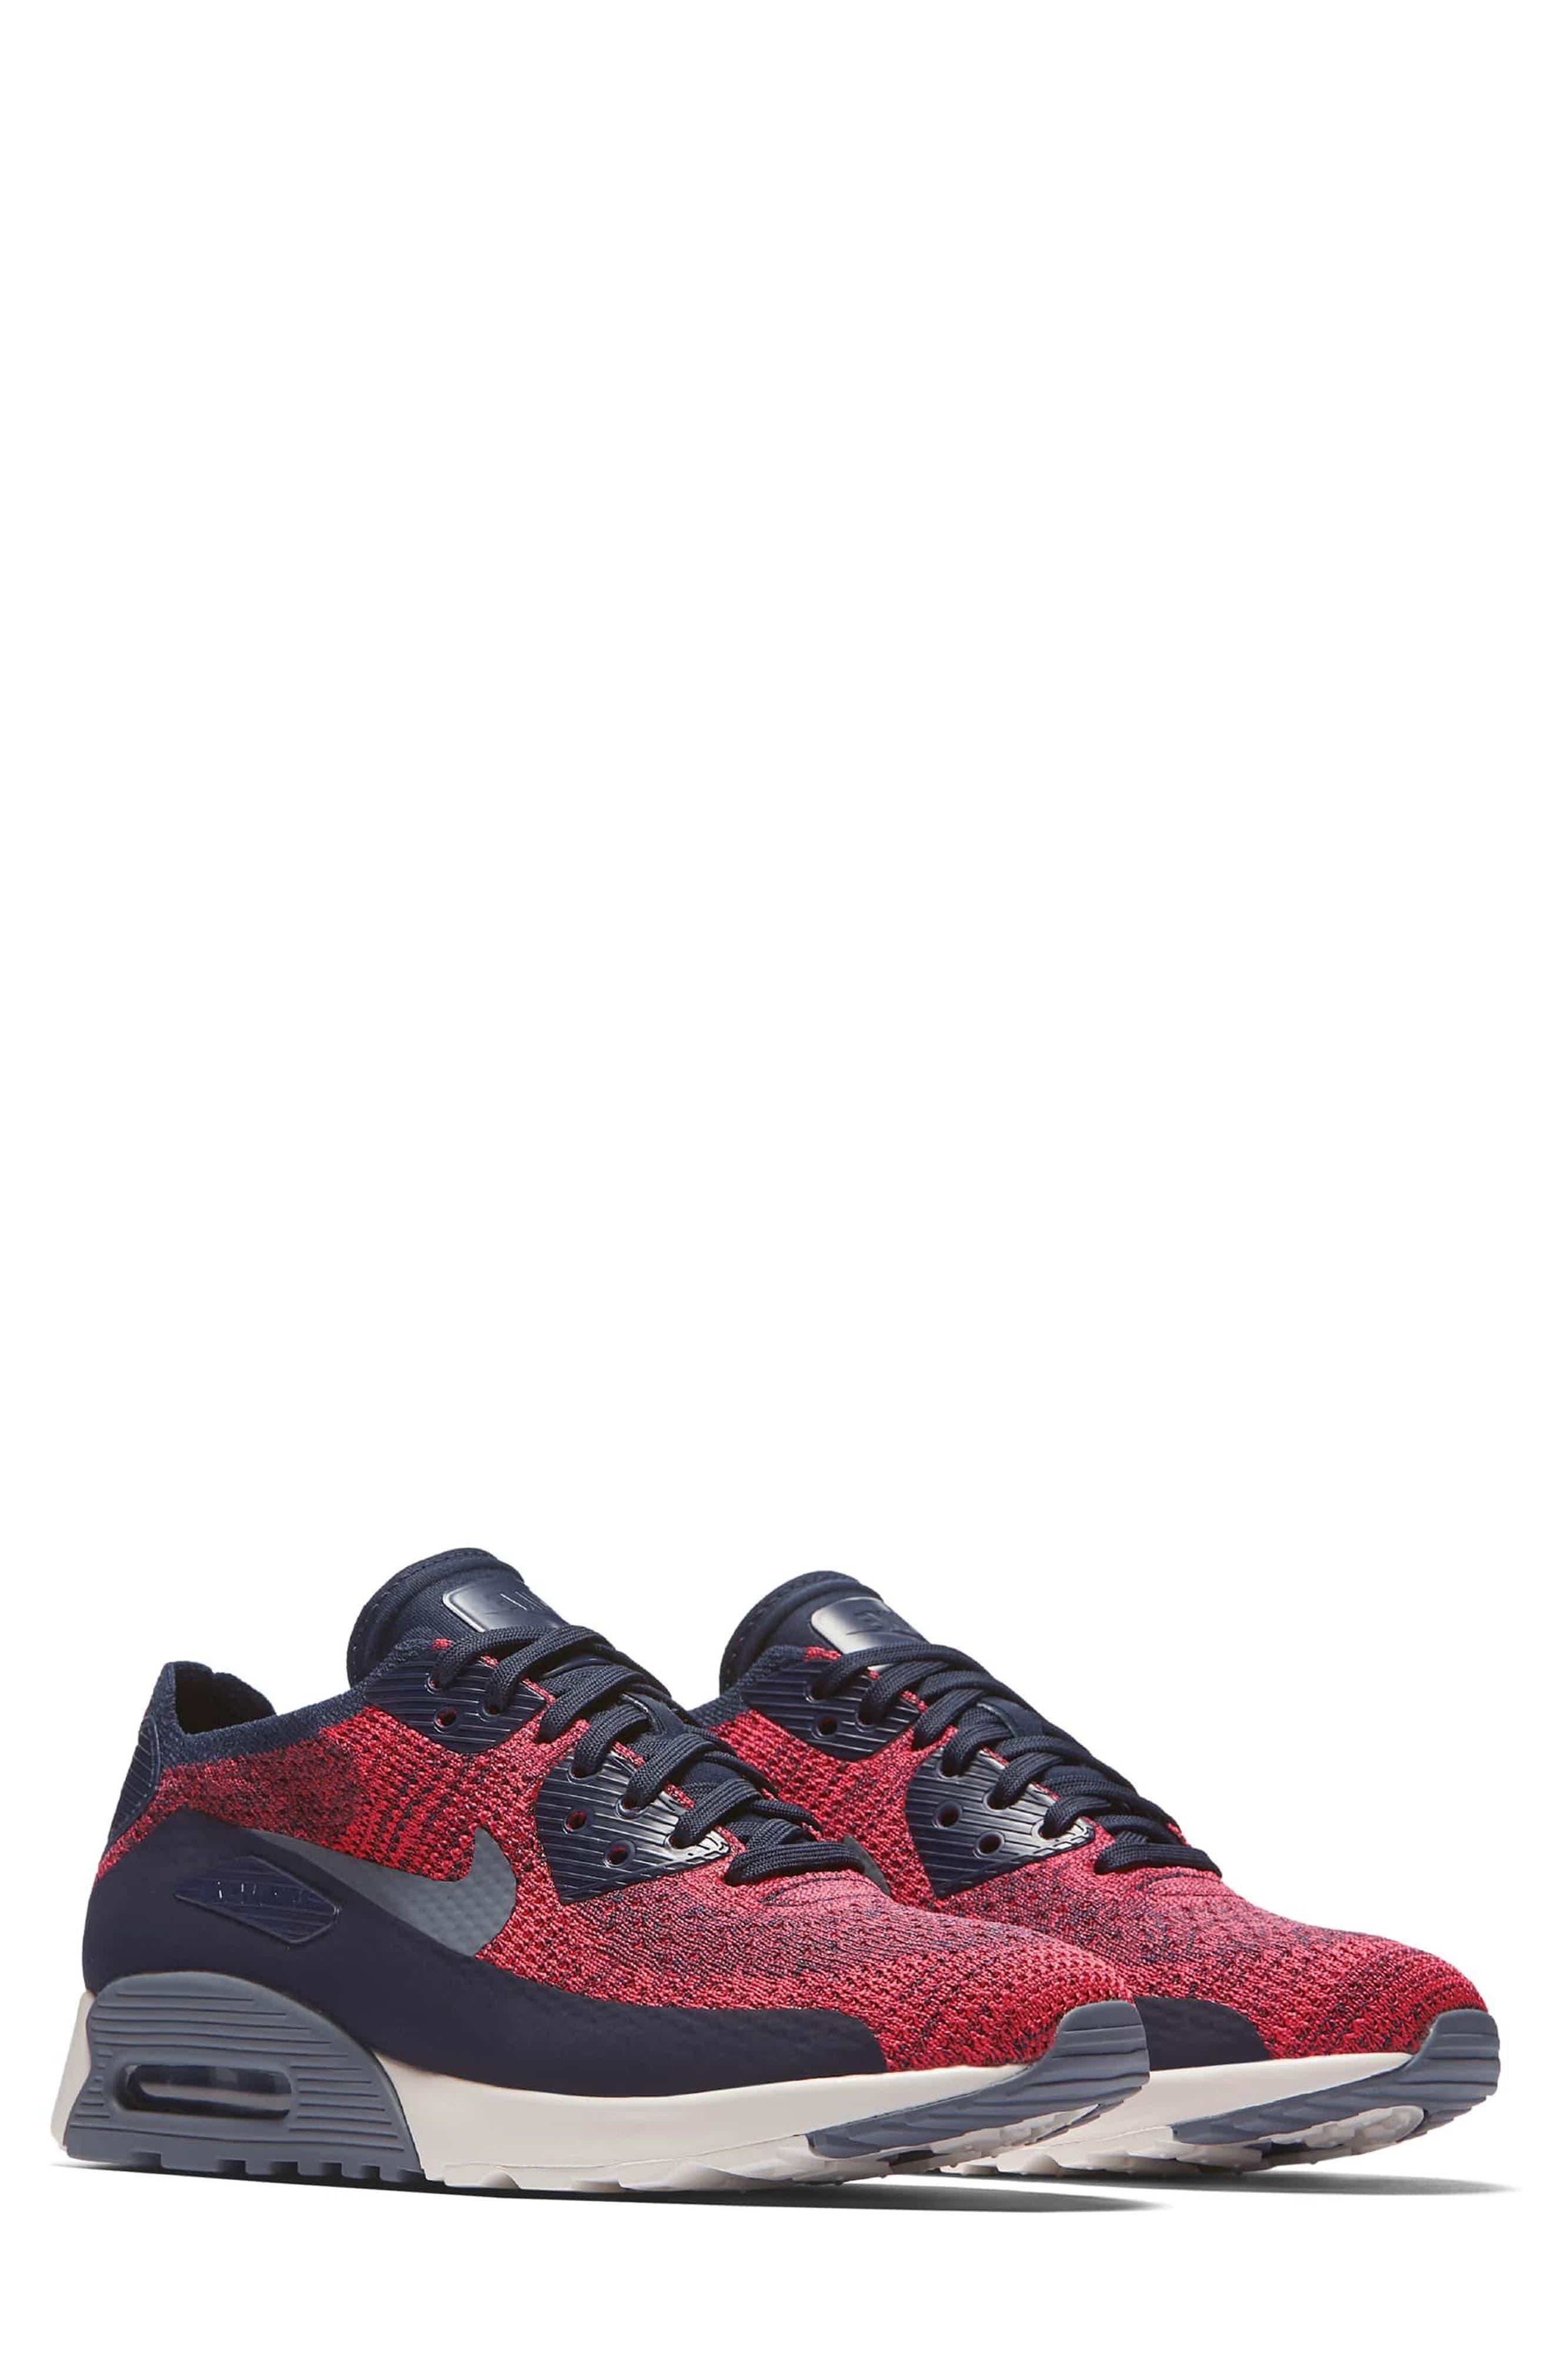 Air Max 90 Flyknit Ultra 2.0 Sneaker,                             Main thumbnail 3, color,